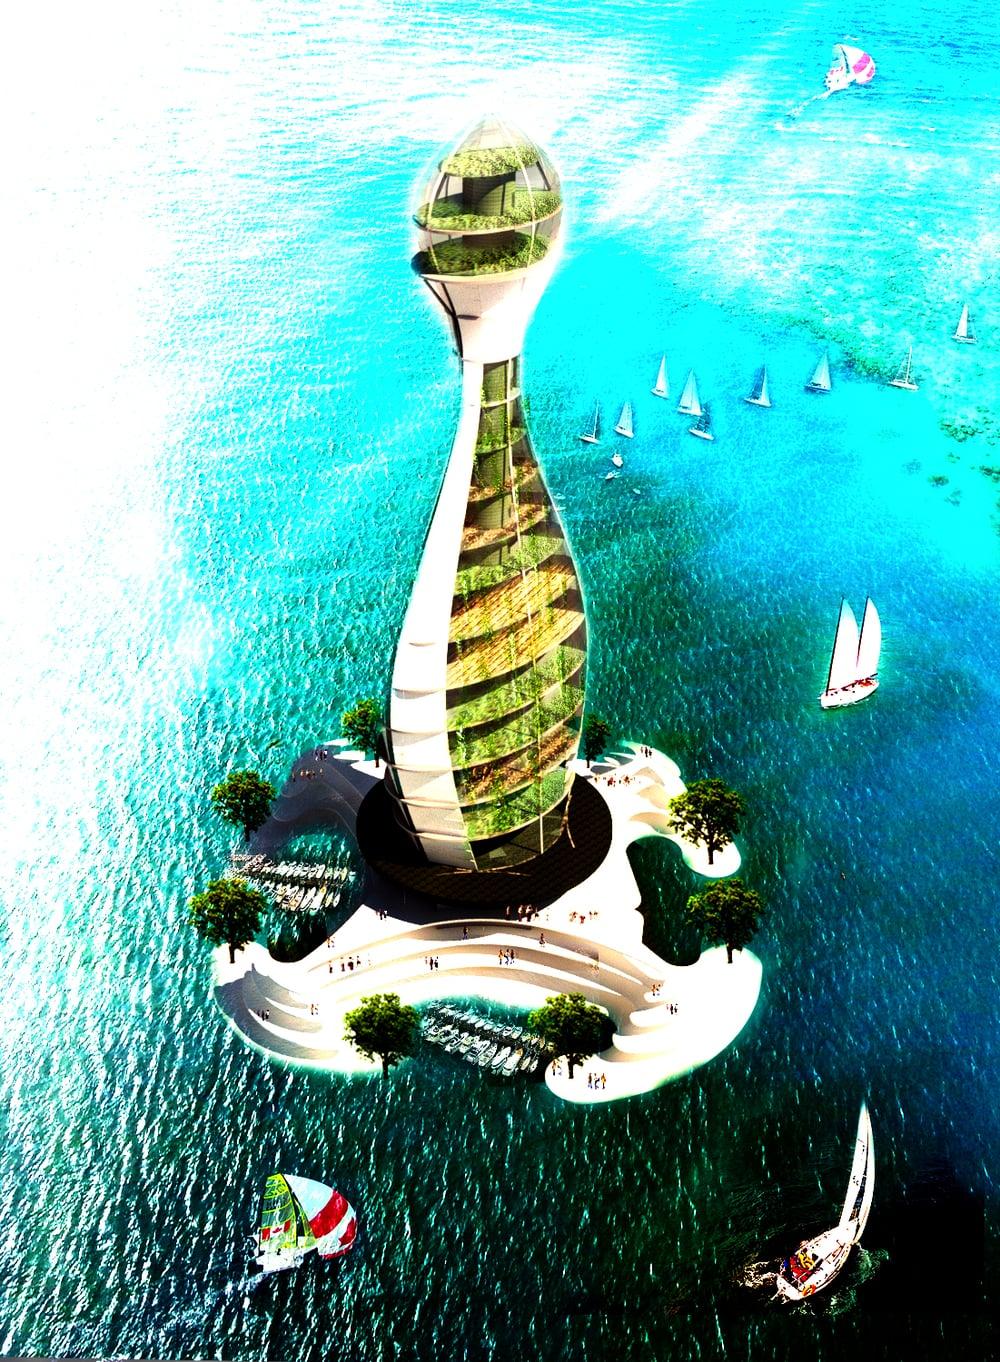 Pandora Ocean Aerial copy.jpg